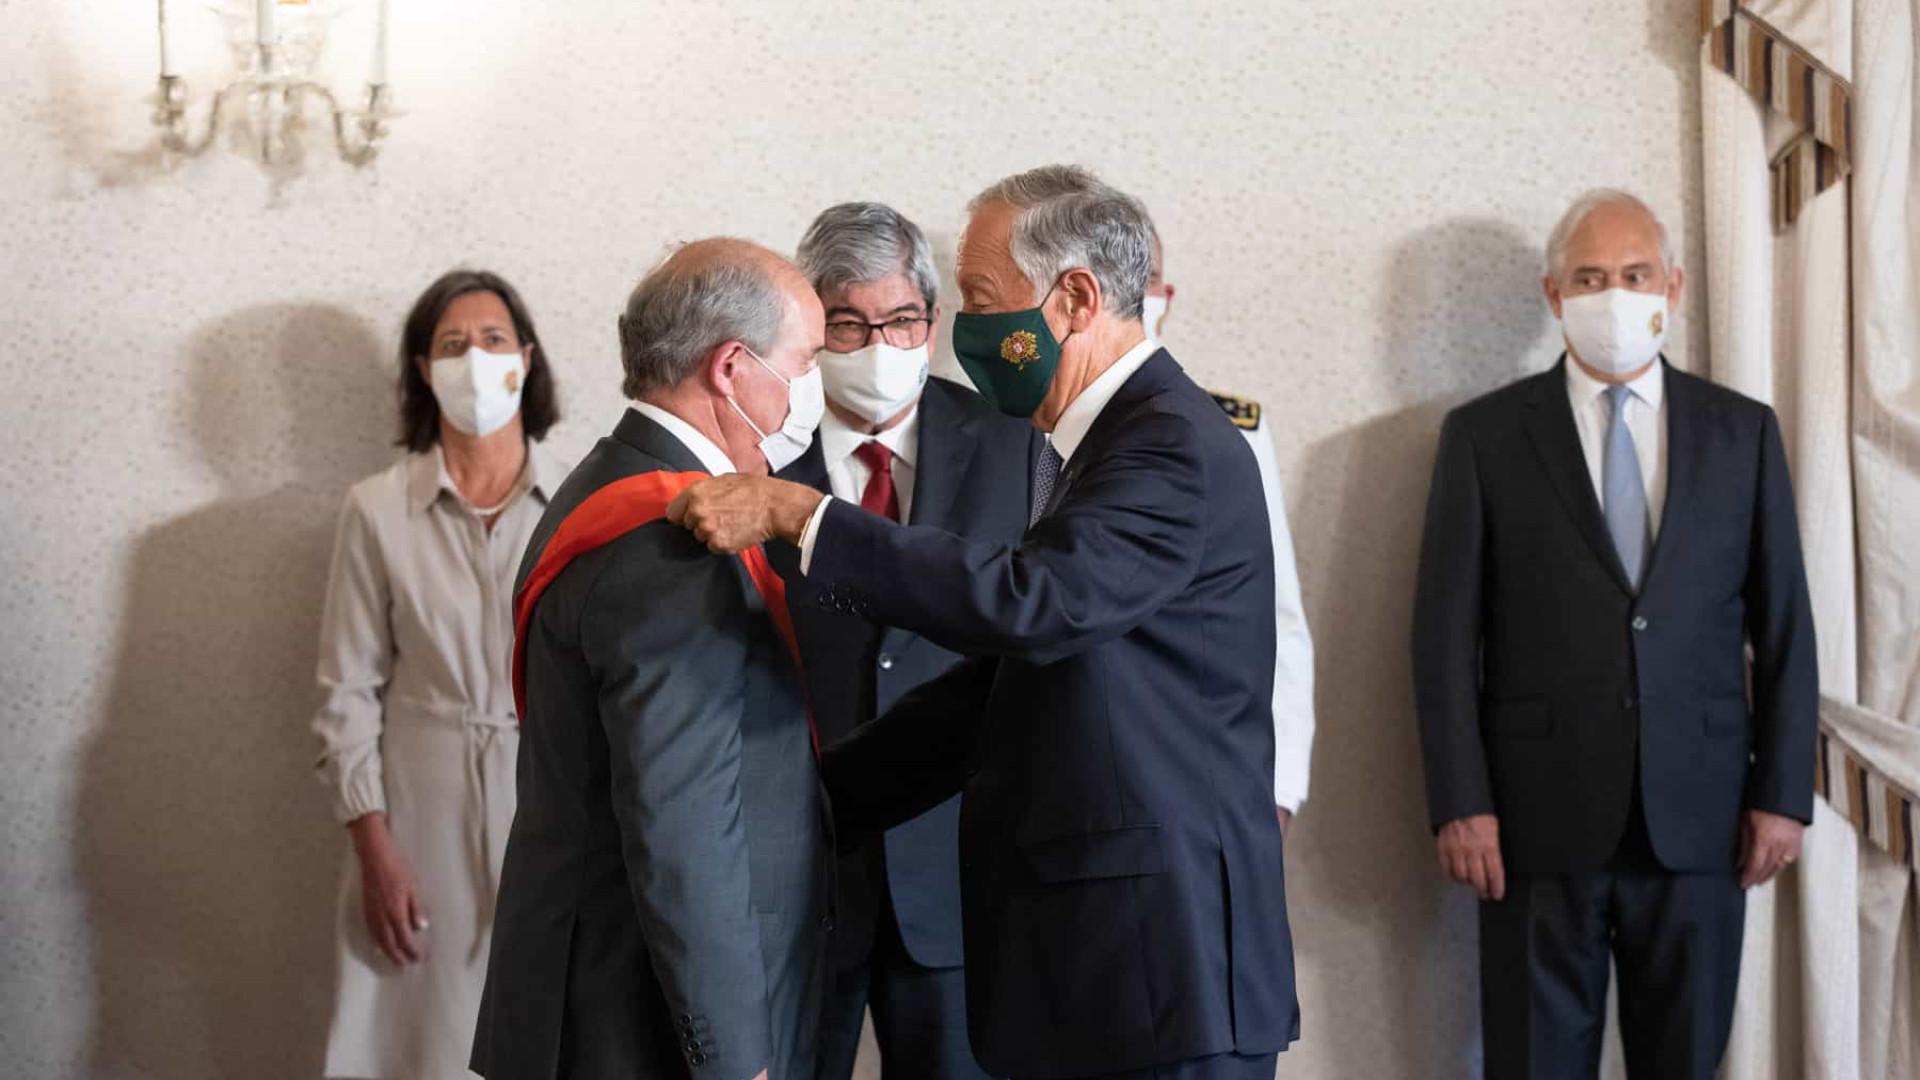 Presidente Marcelo condecora ex-presidente do Supremo Tribunal